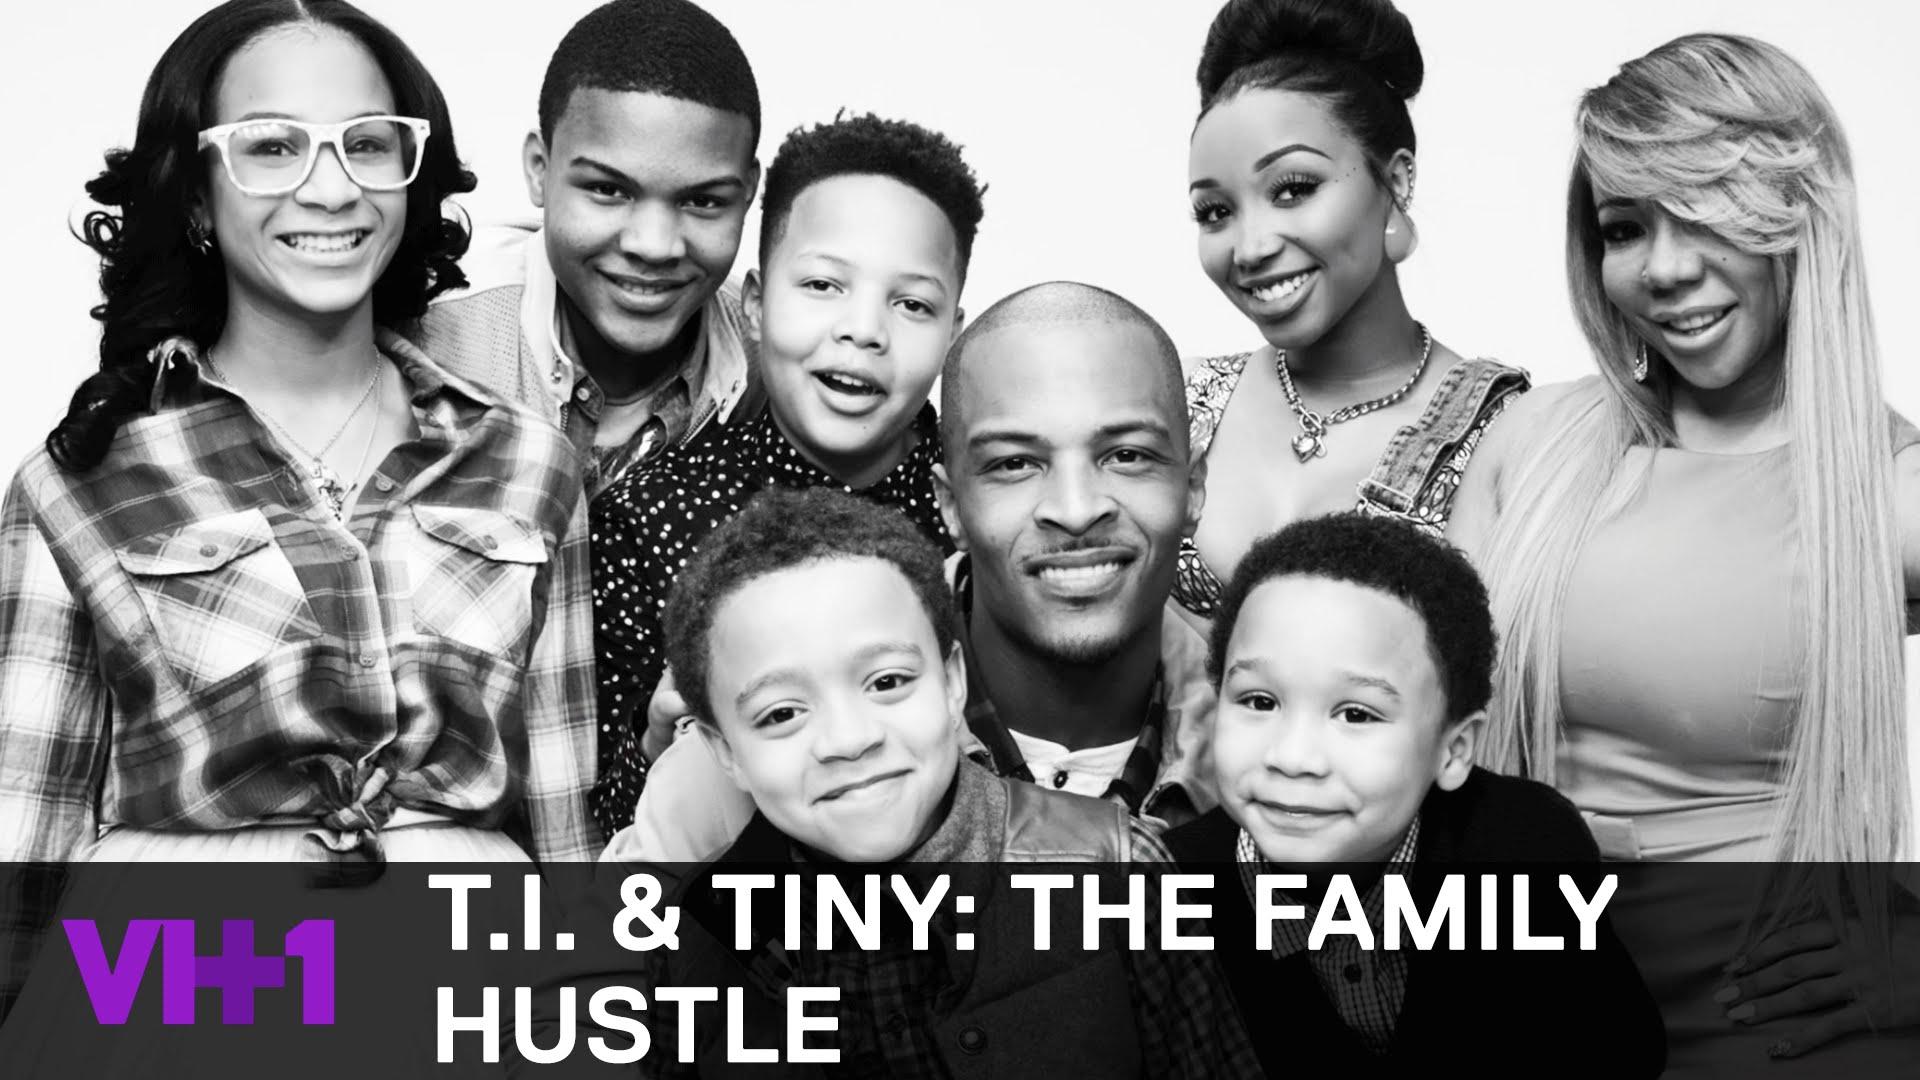 T.i. & Tiny: The Family Hustle: Season 5